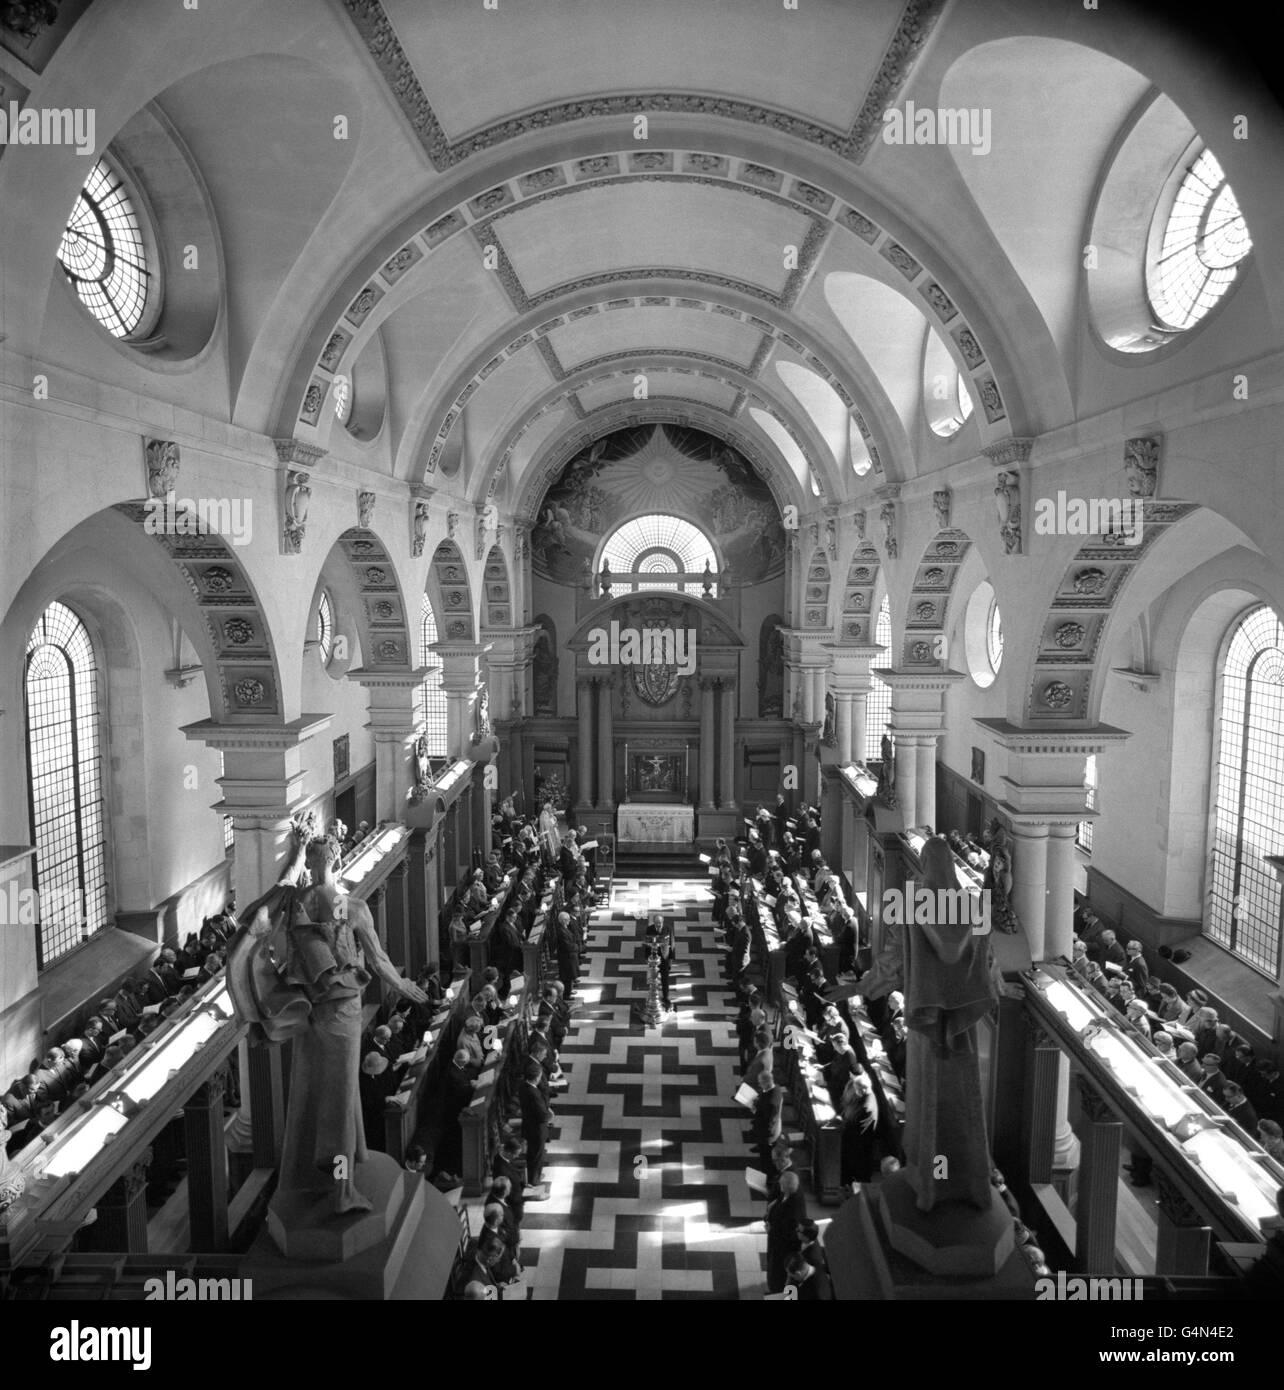 Royalty - Press Association Centenary - St. Bride's Church, Fleet Street, London - Stock Image